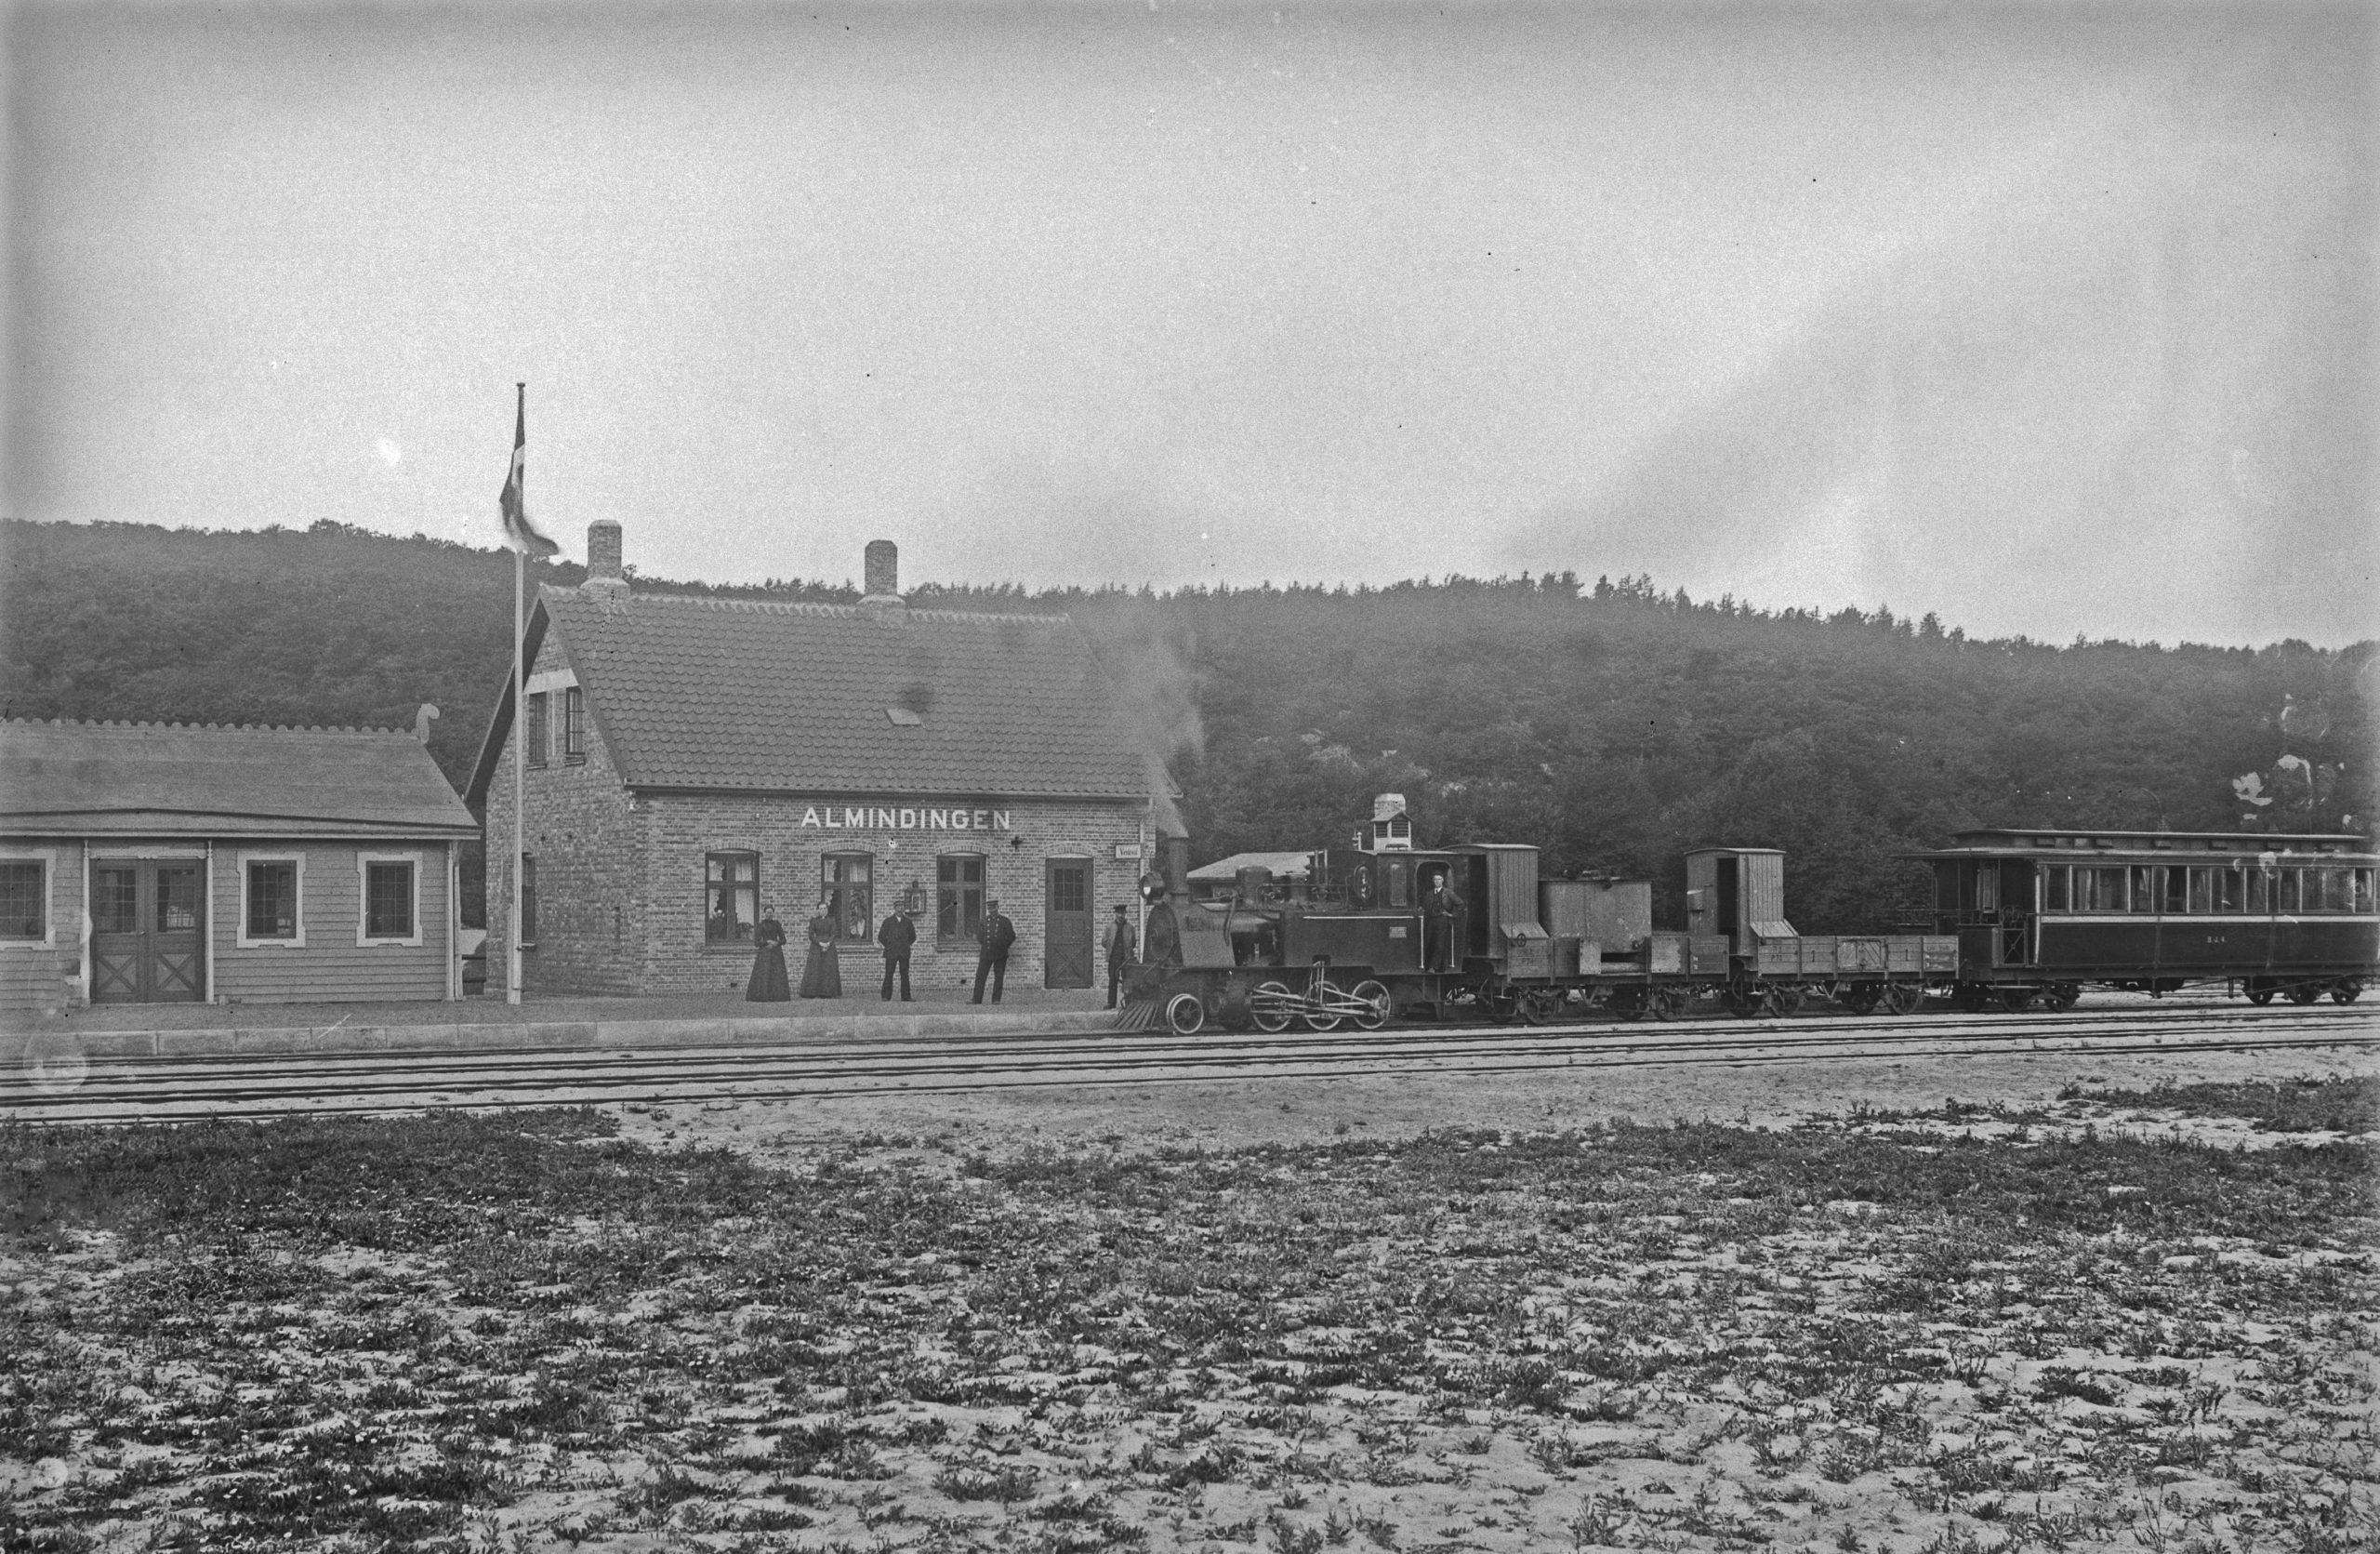 Almindingen Station